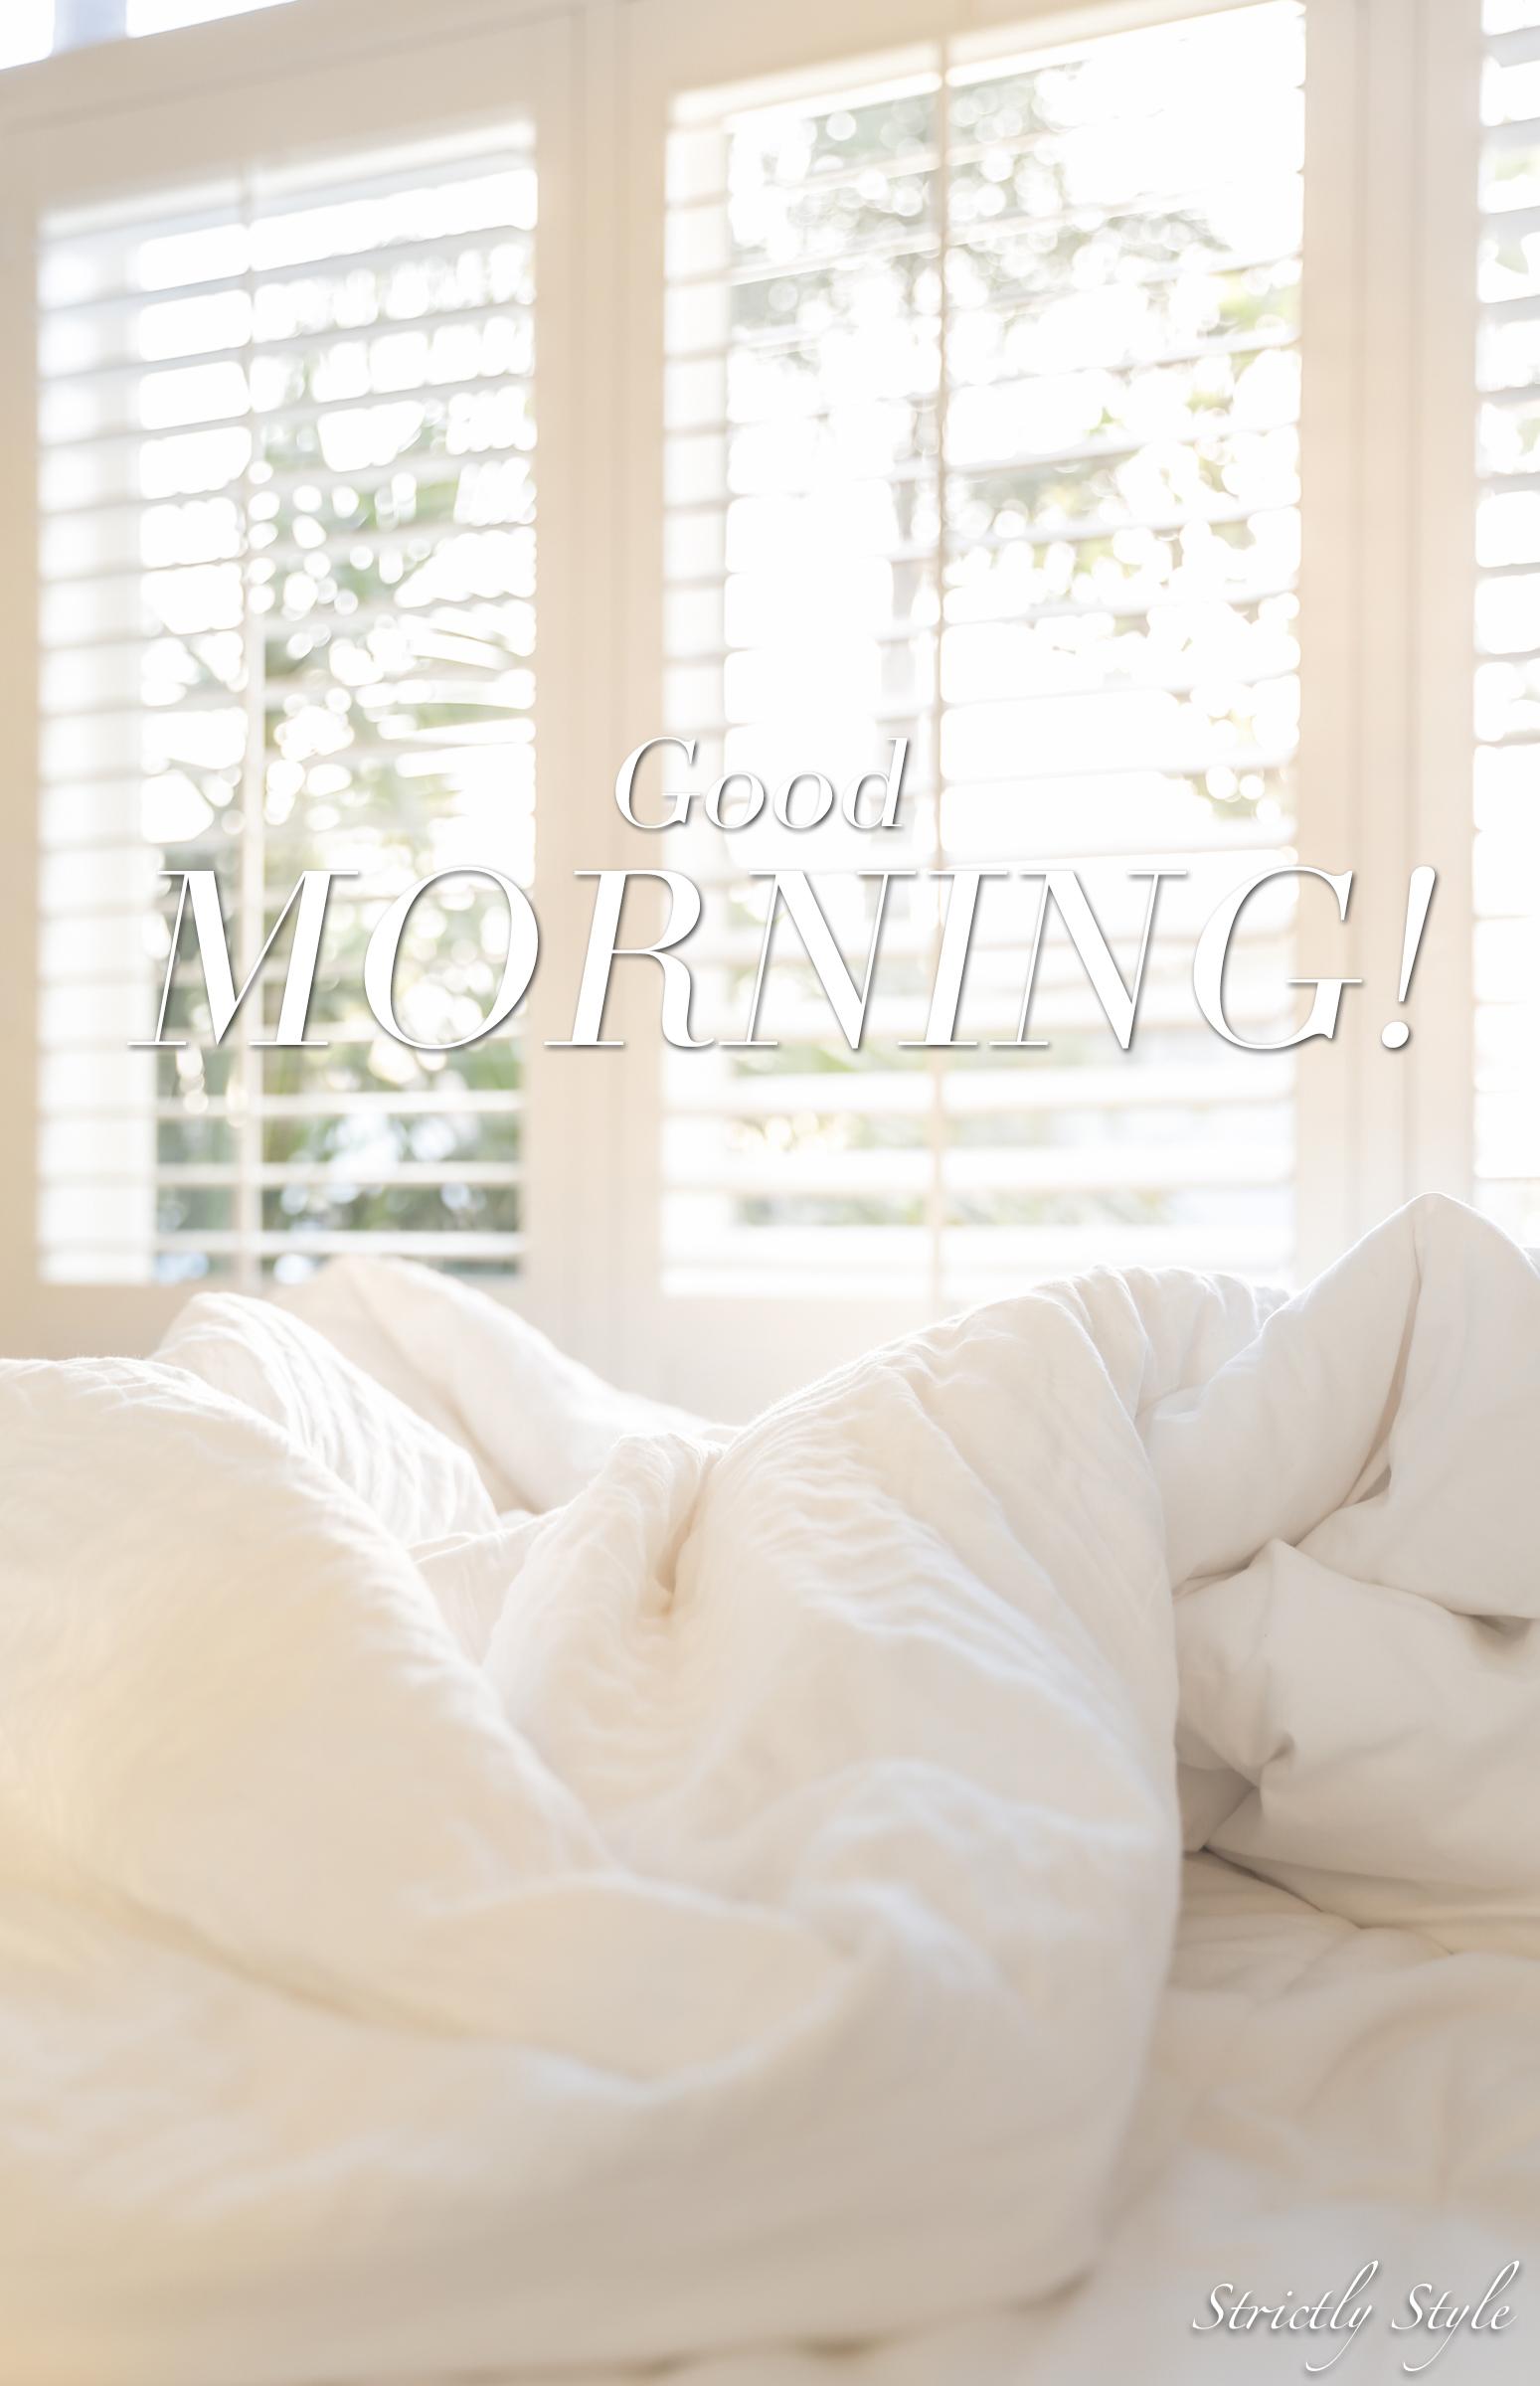 goodmorningsheets